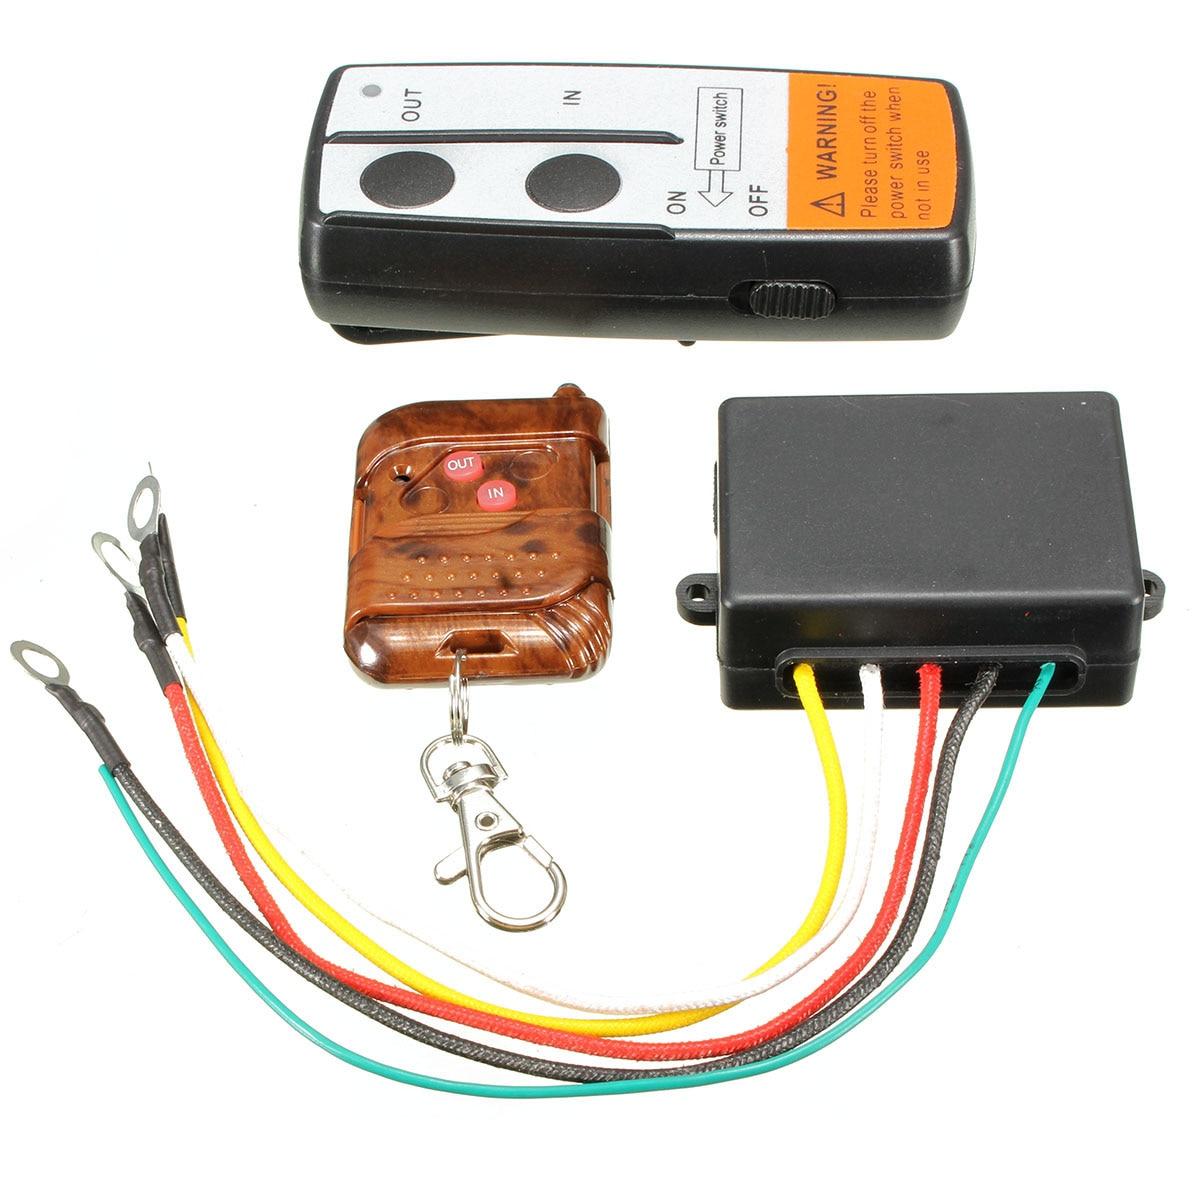 Electric Wireless Winch Remote Control Handset 12V Heavy Duty For Truck Atv SUV